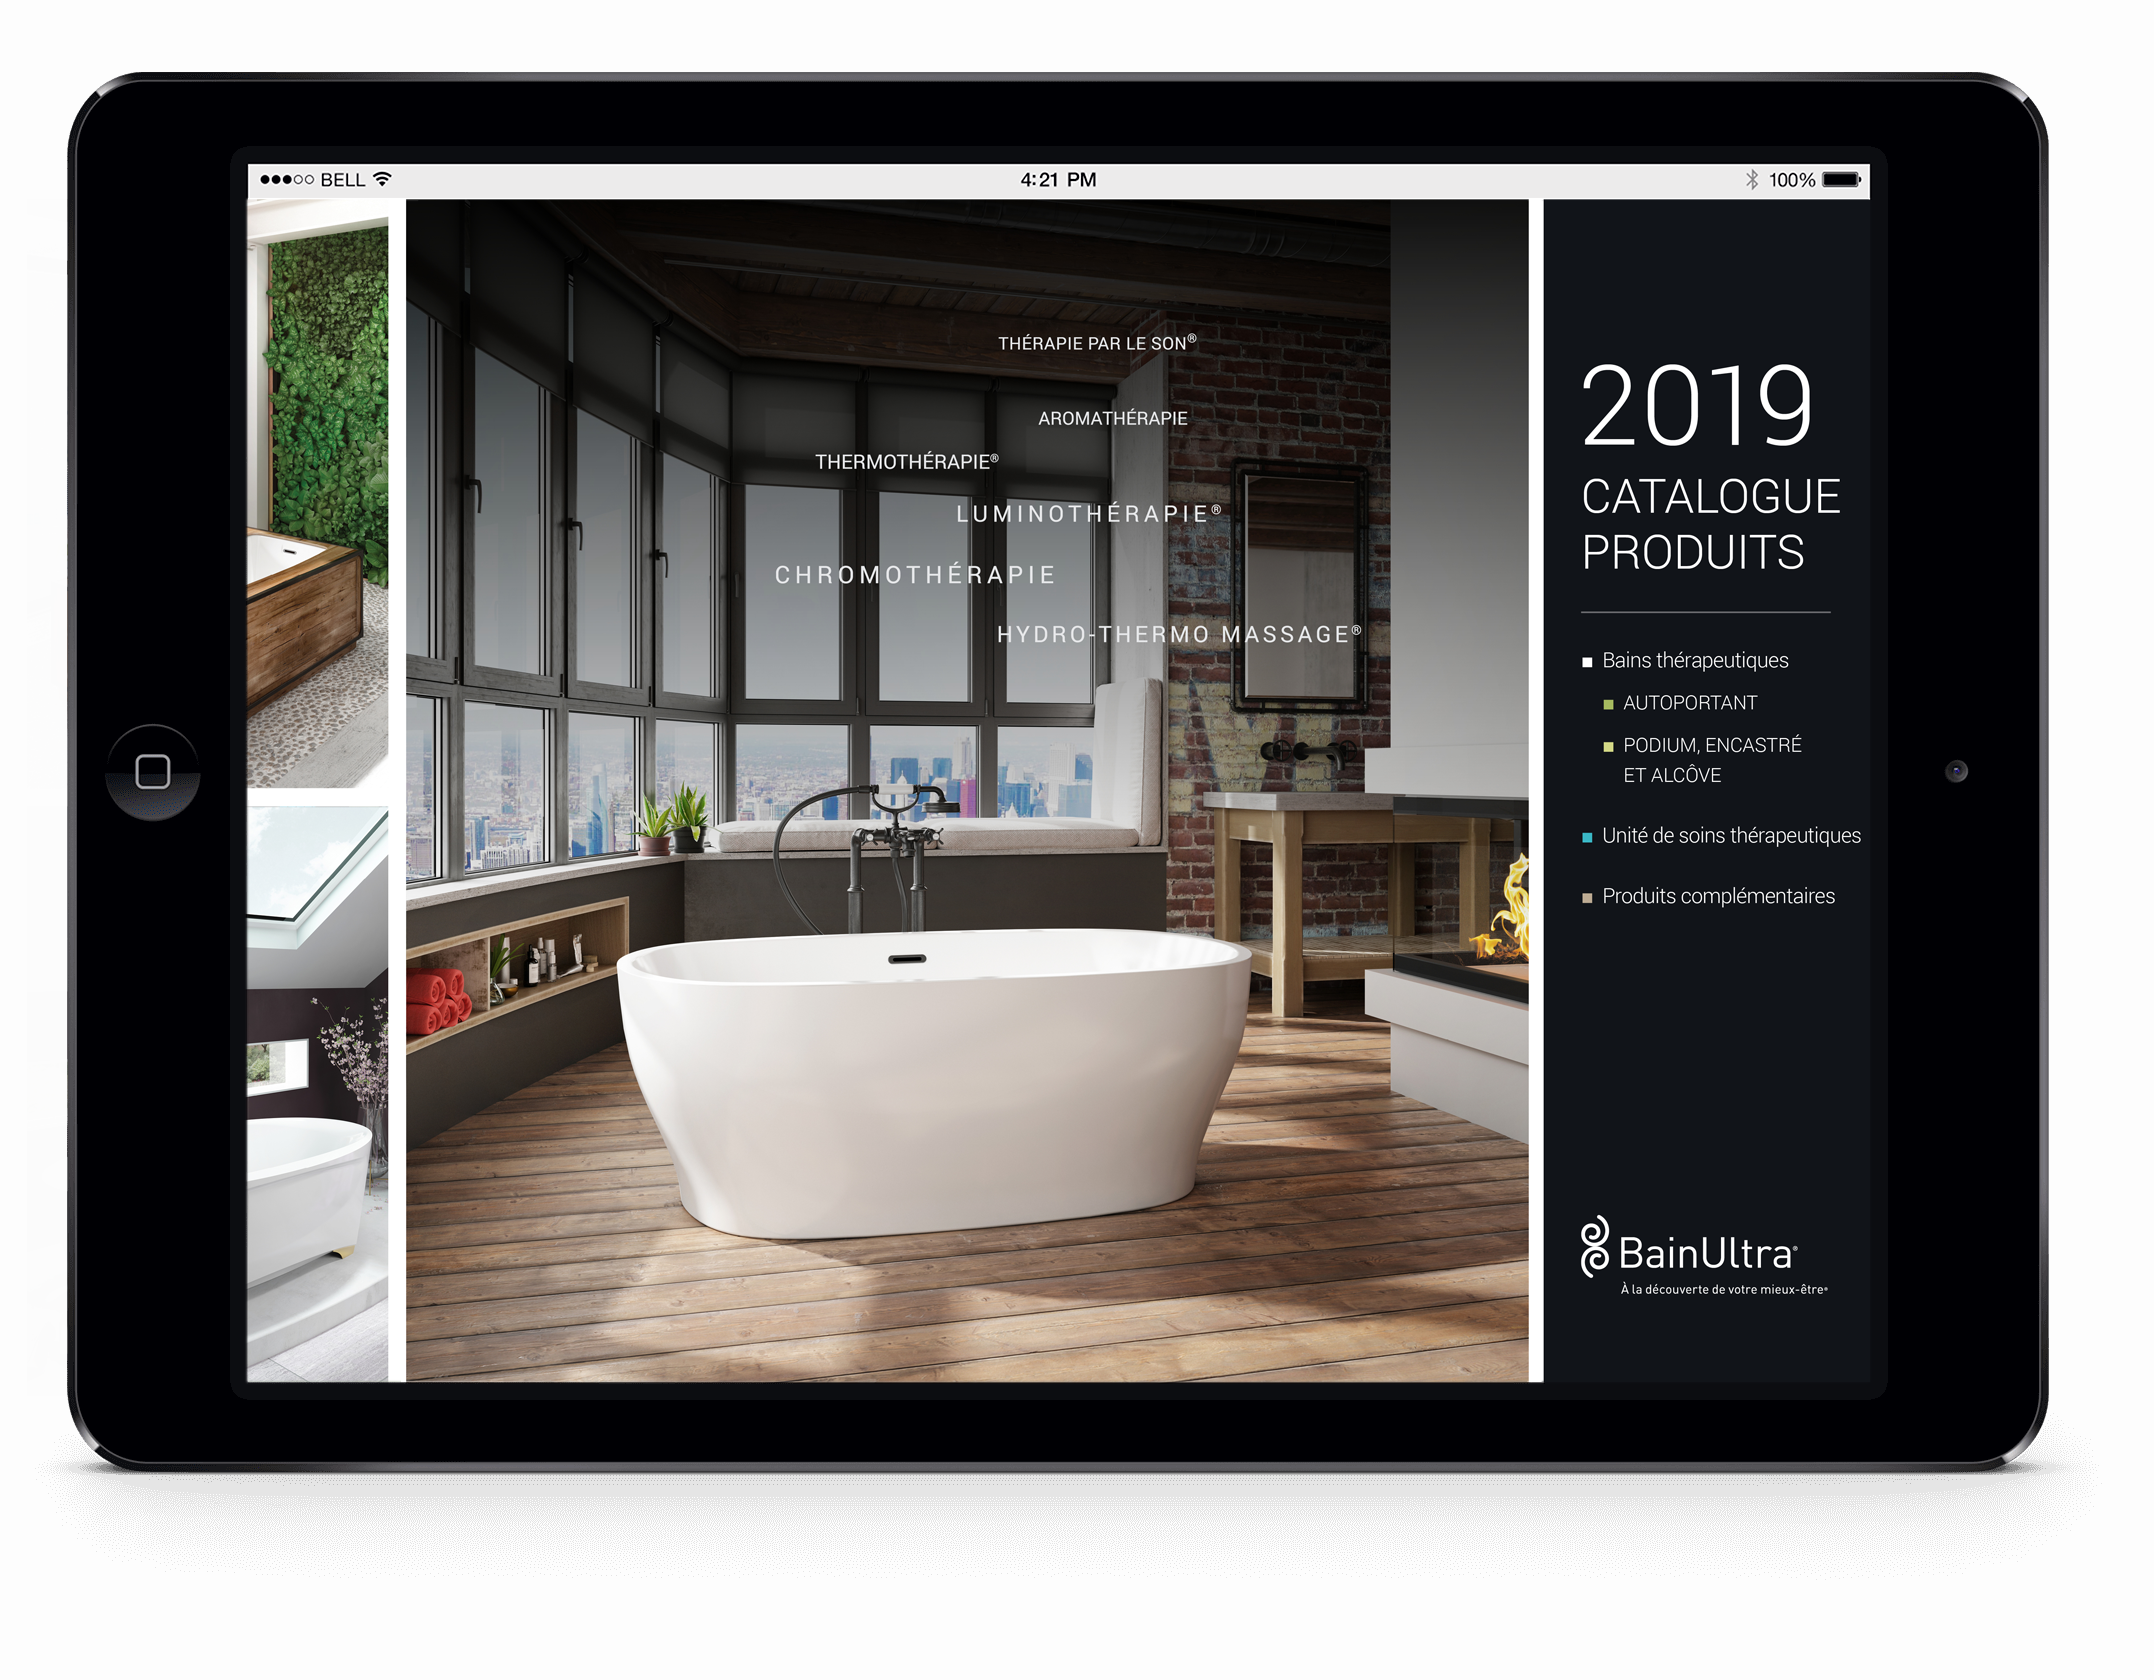 Catalogue de produits 2019